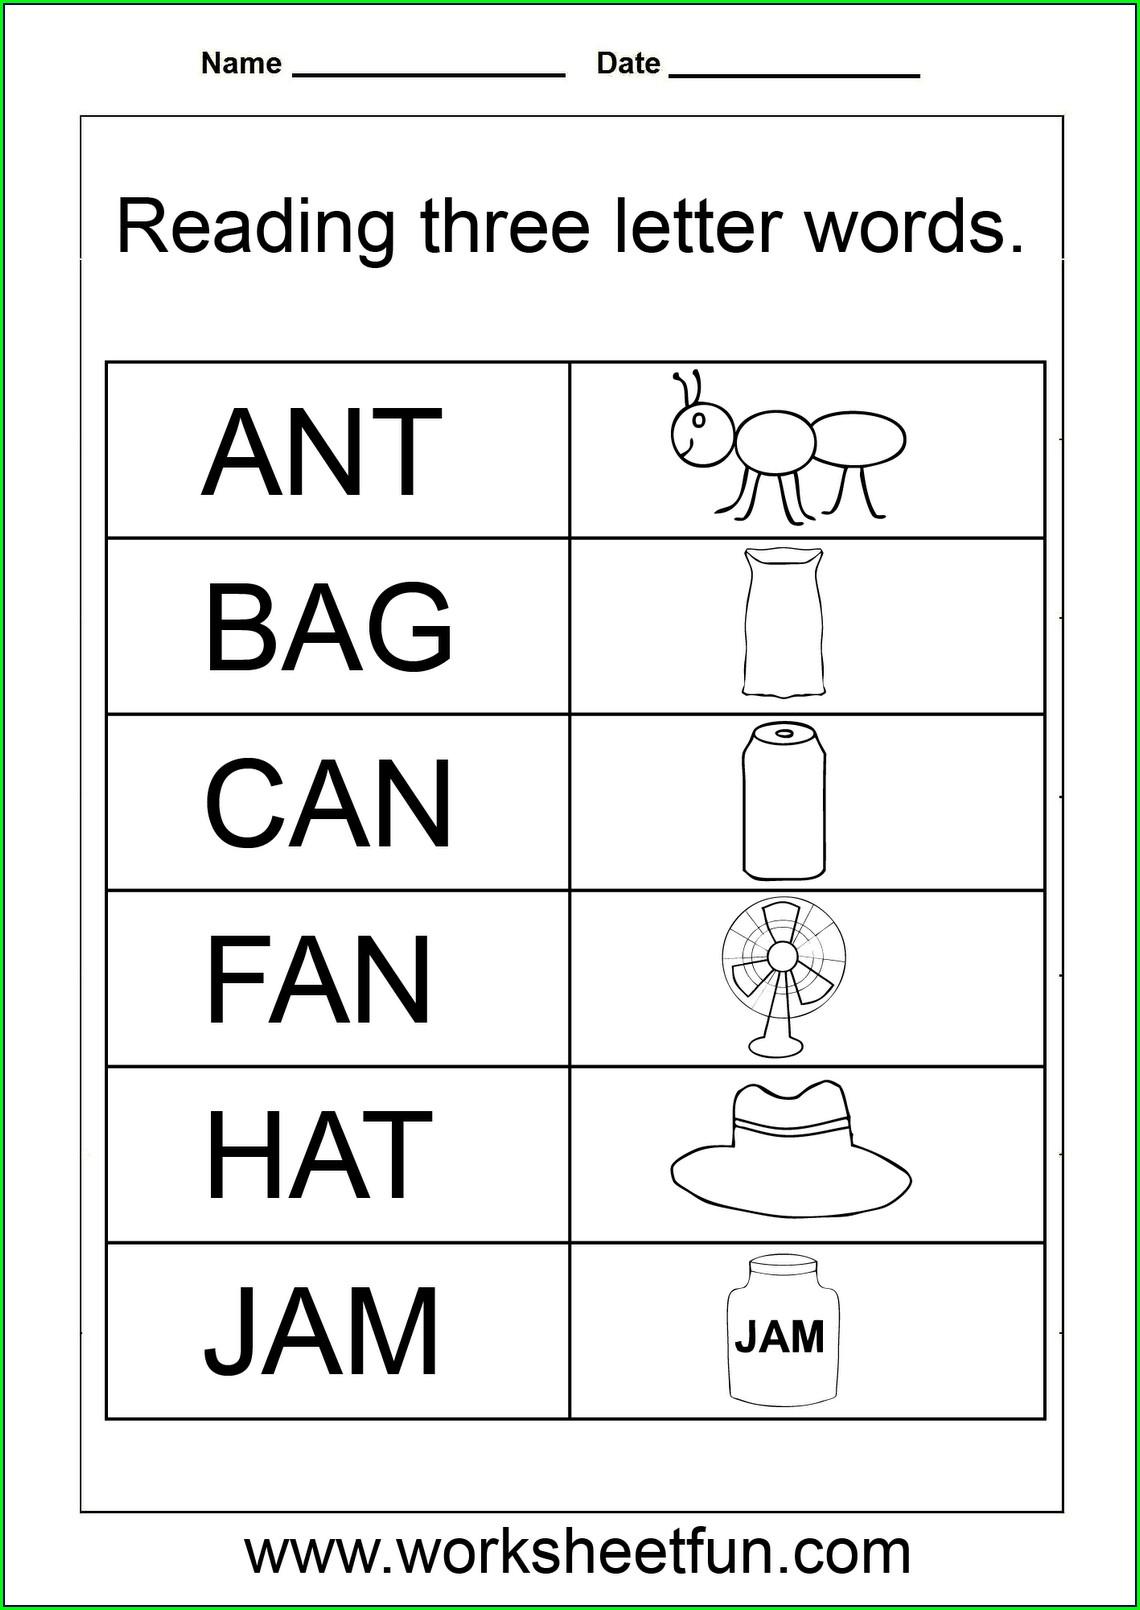 Spelling Words Worksheets For Kindergarten